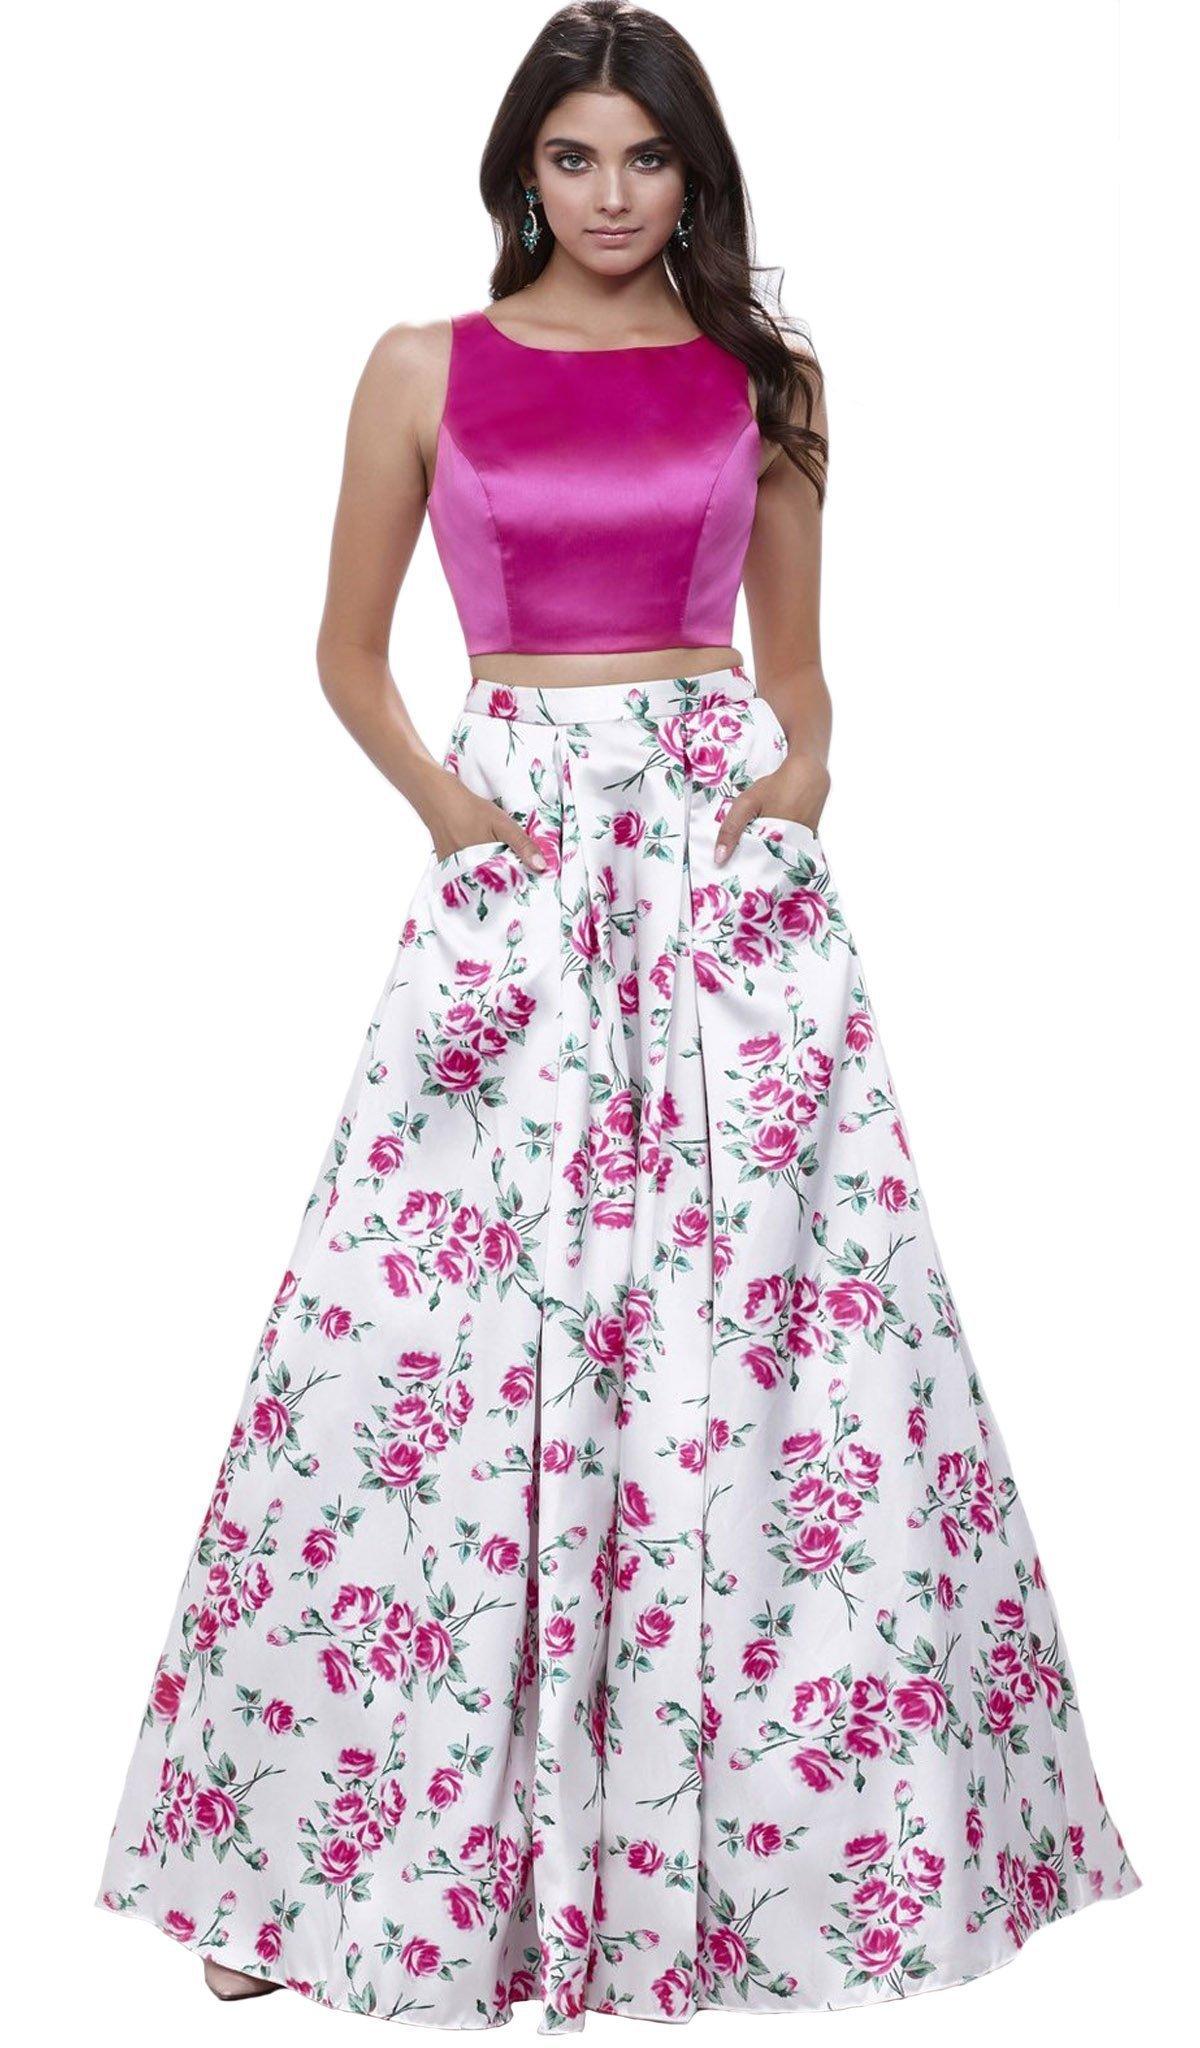 Nox Anabel - 8331 Bateau Neck Two-Piece Floral A-line Evening Gown